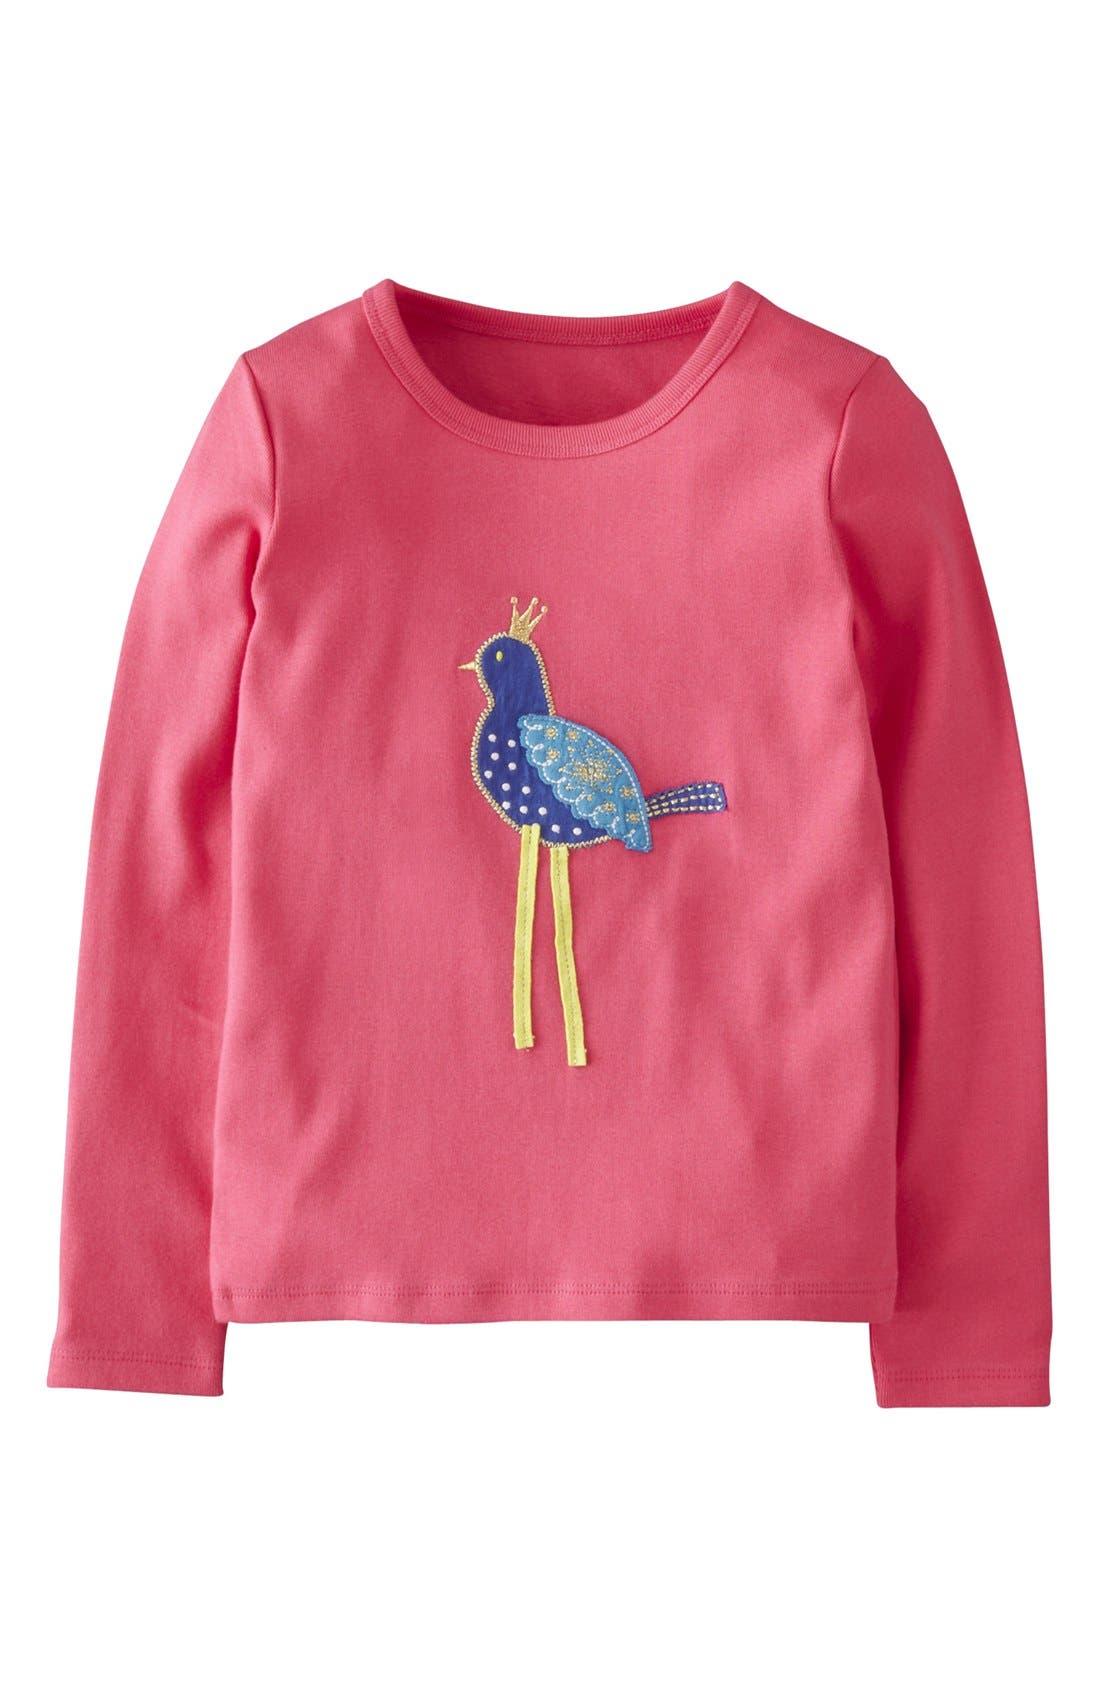 Main Image - Mini Boden Appliqué Long Sleeve Tee (Toddler Girls, Little Girls & Big Girls)